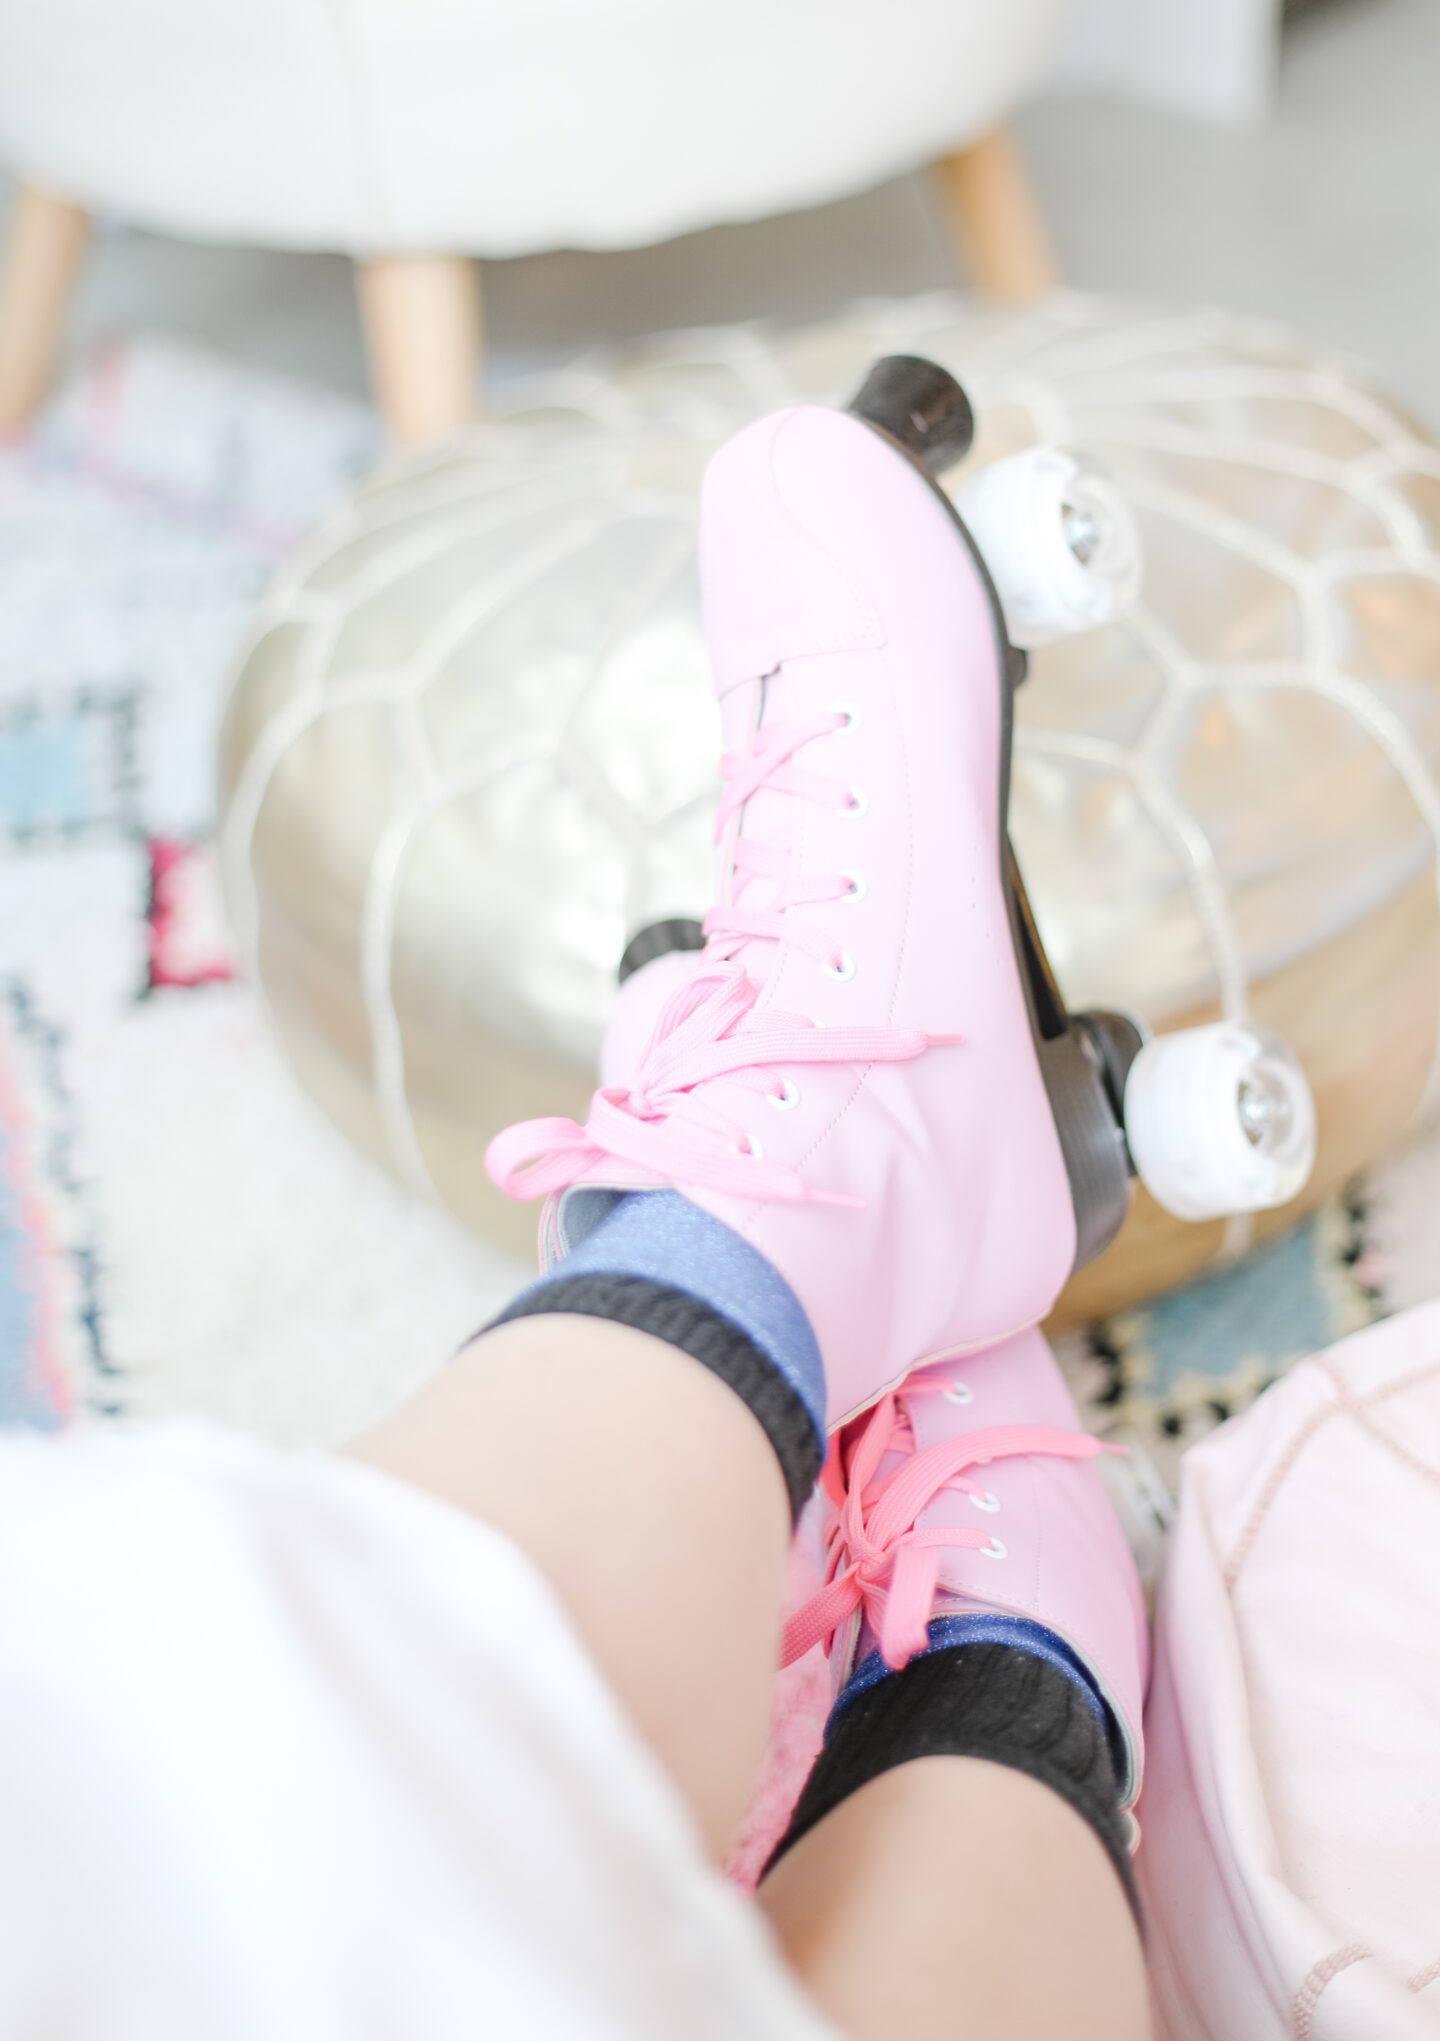 Roller skates in pink detail